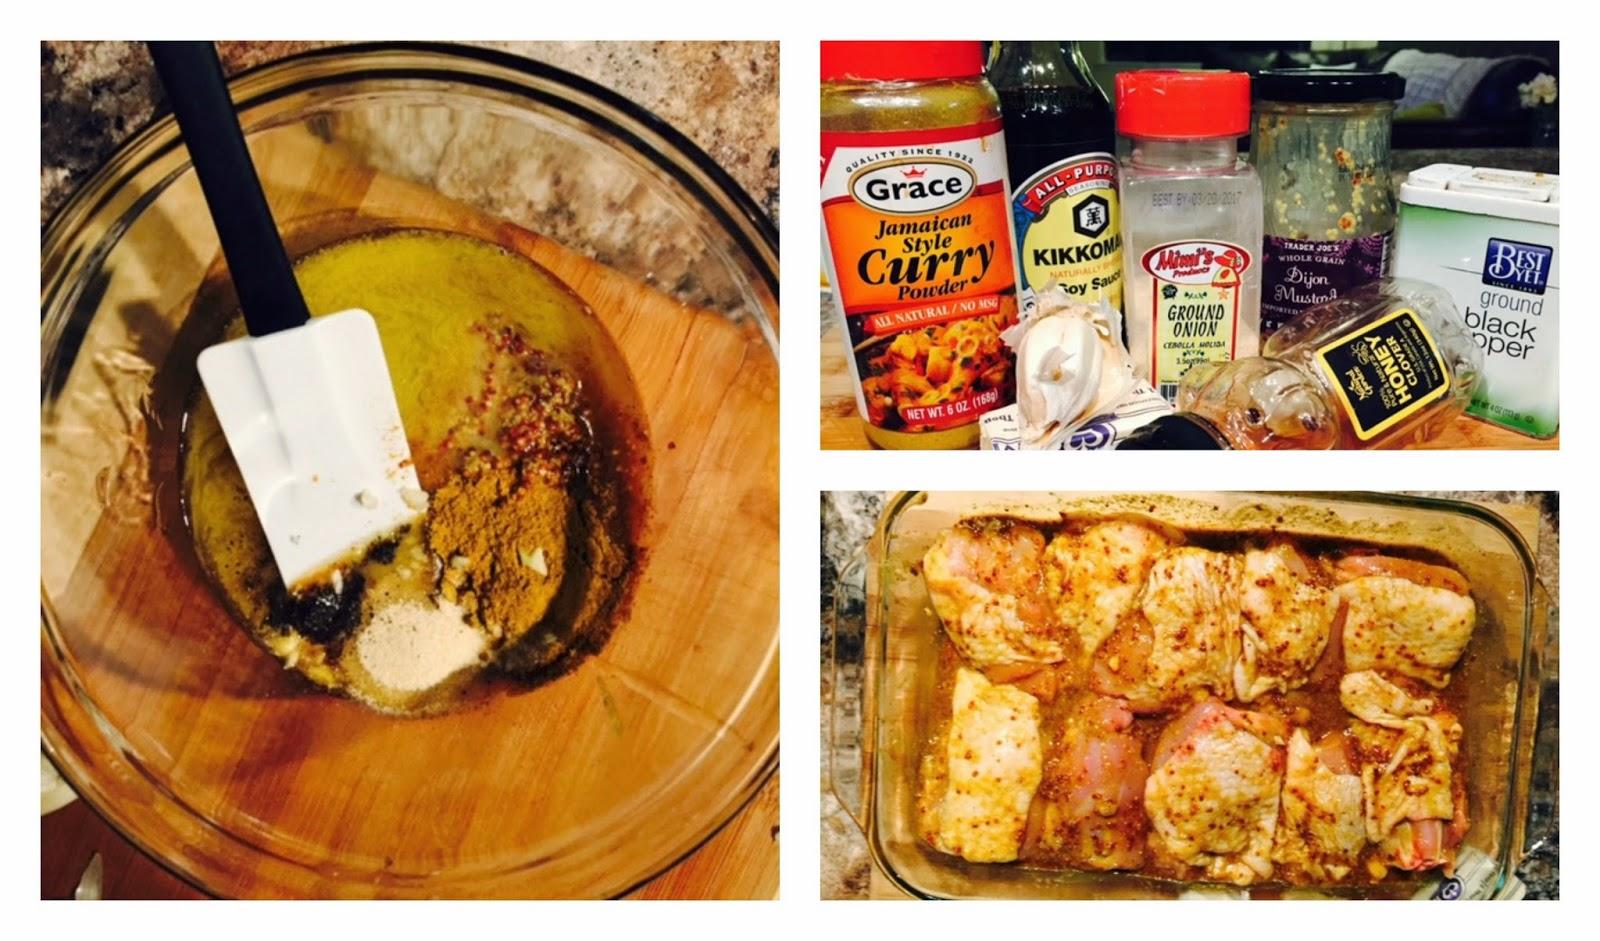 Honey Curry Chicken Thighs